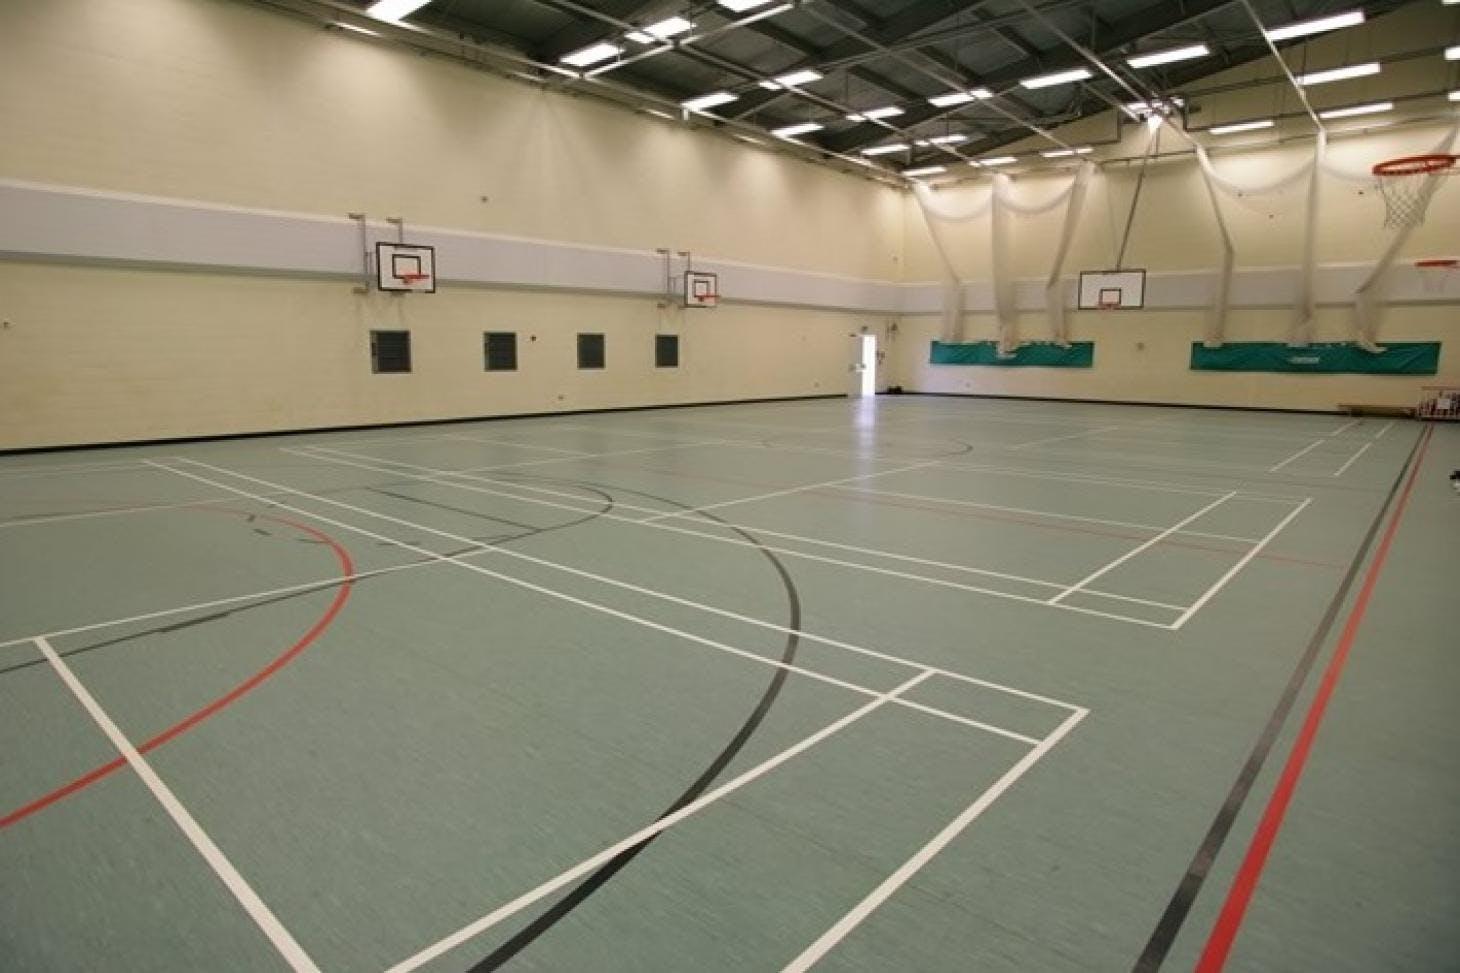 Denbigh High School Indoor | Hard badminton court